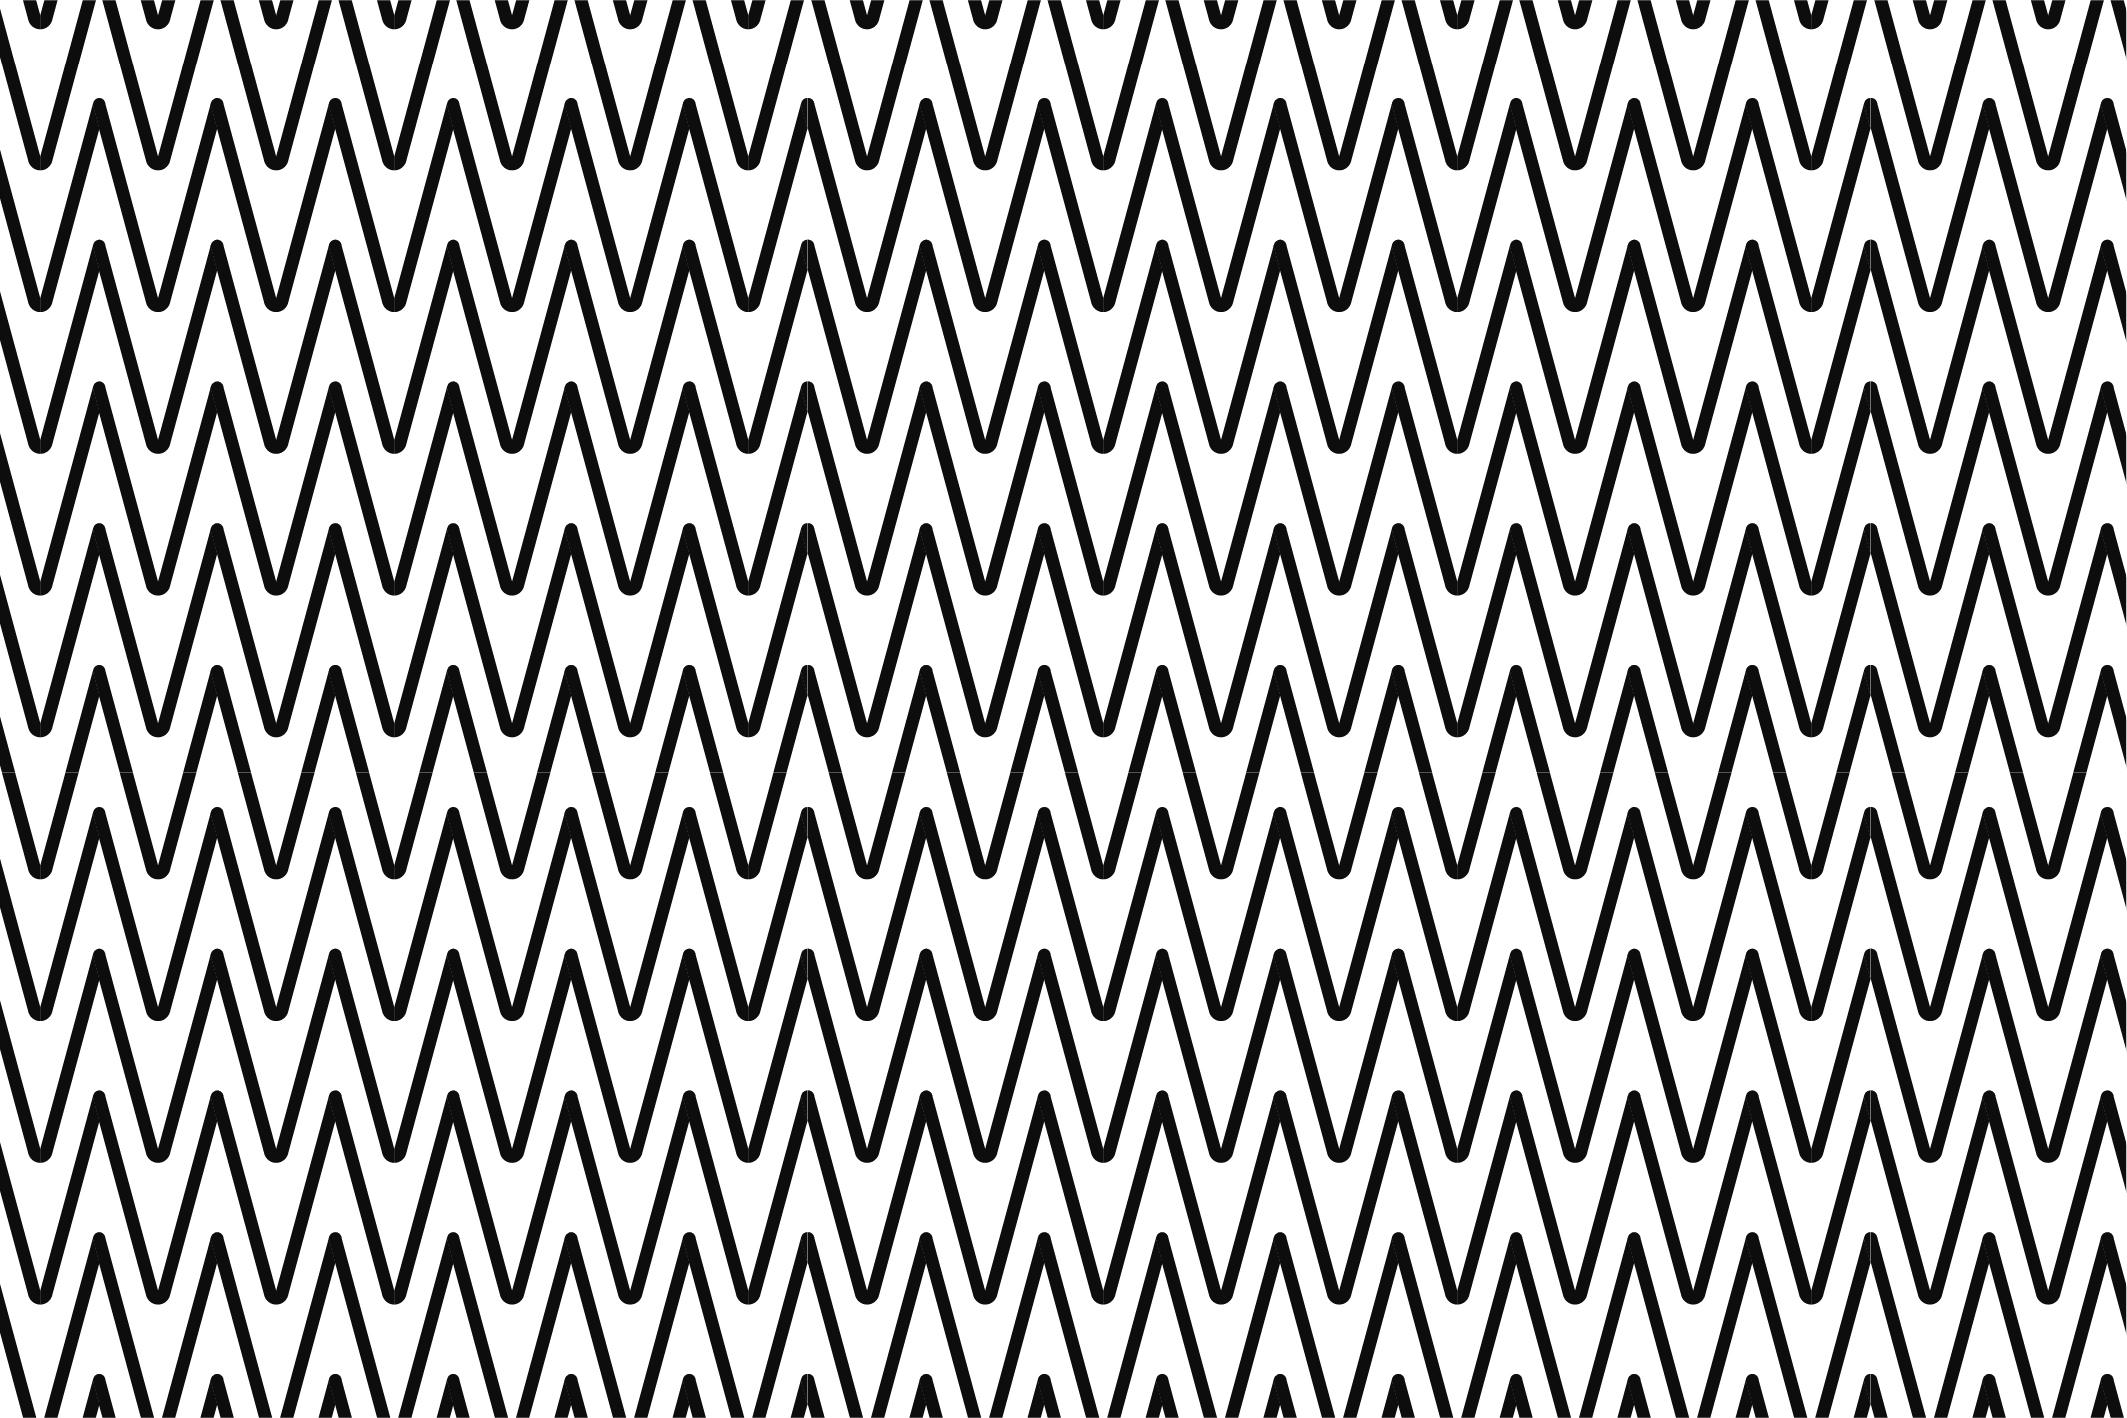 Wave&Zigzag seamless patterns. B&W. example image 8